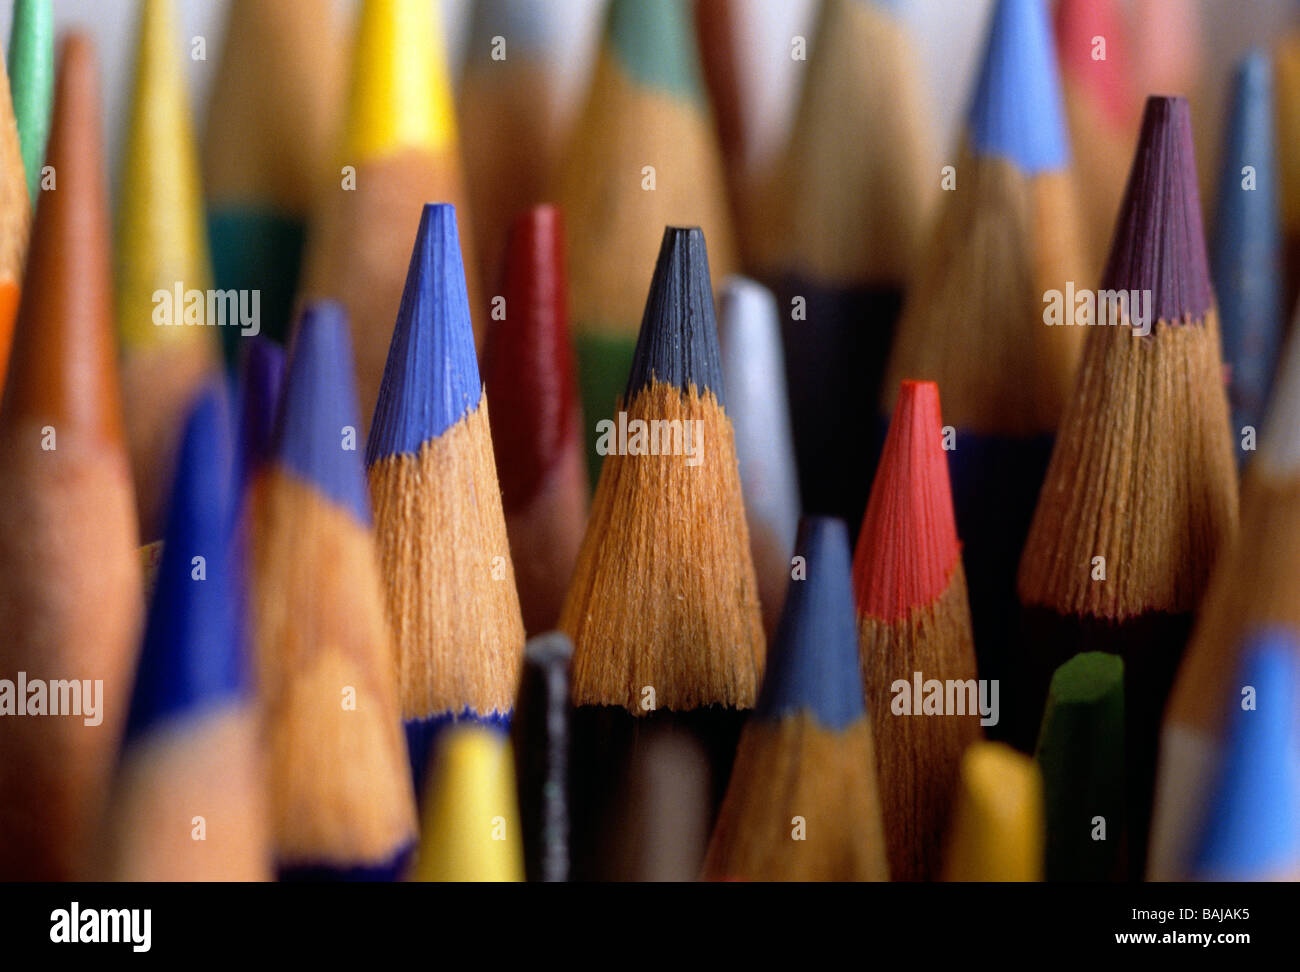 Green Draw Sketch Stockfotos & Green Draw Sketch Bilder - Seite 2 ...